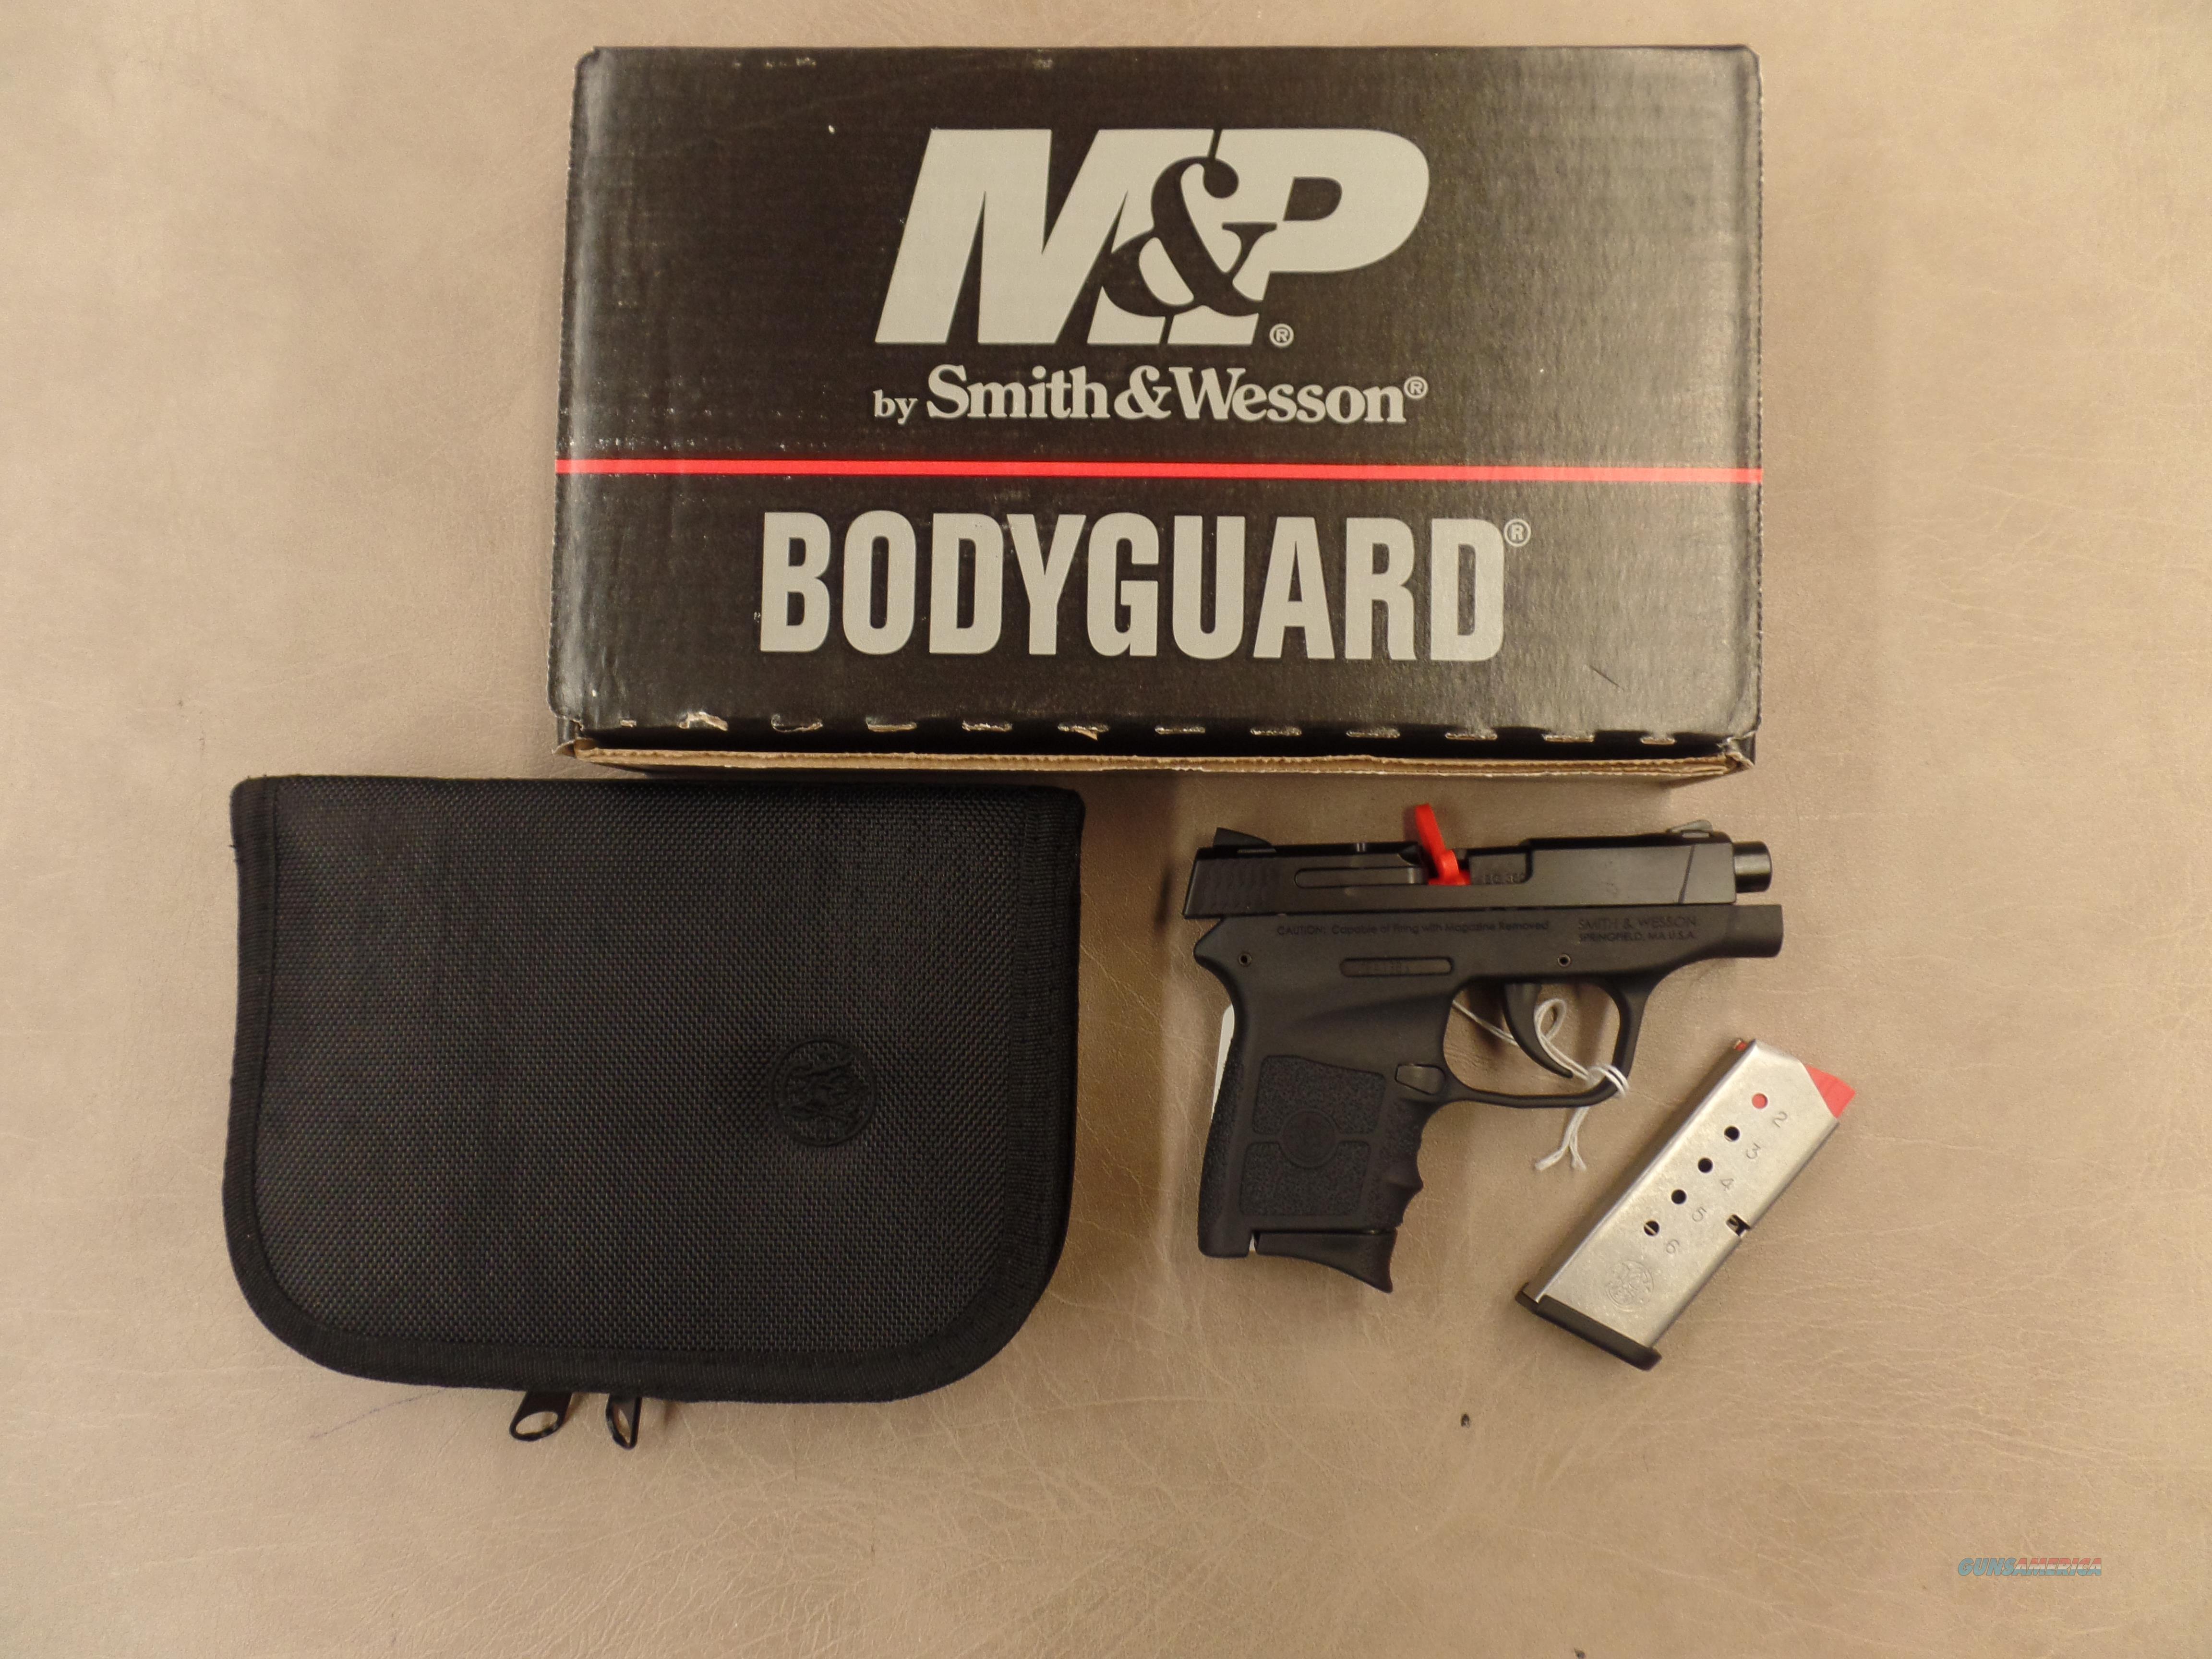 Smith & Wesson Bodyguard 380 ACP.  Guns > Pistols > Smith & Wesson Pistols - Autos > Polymer Frame